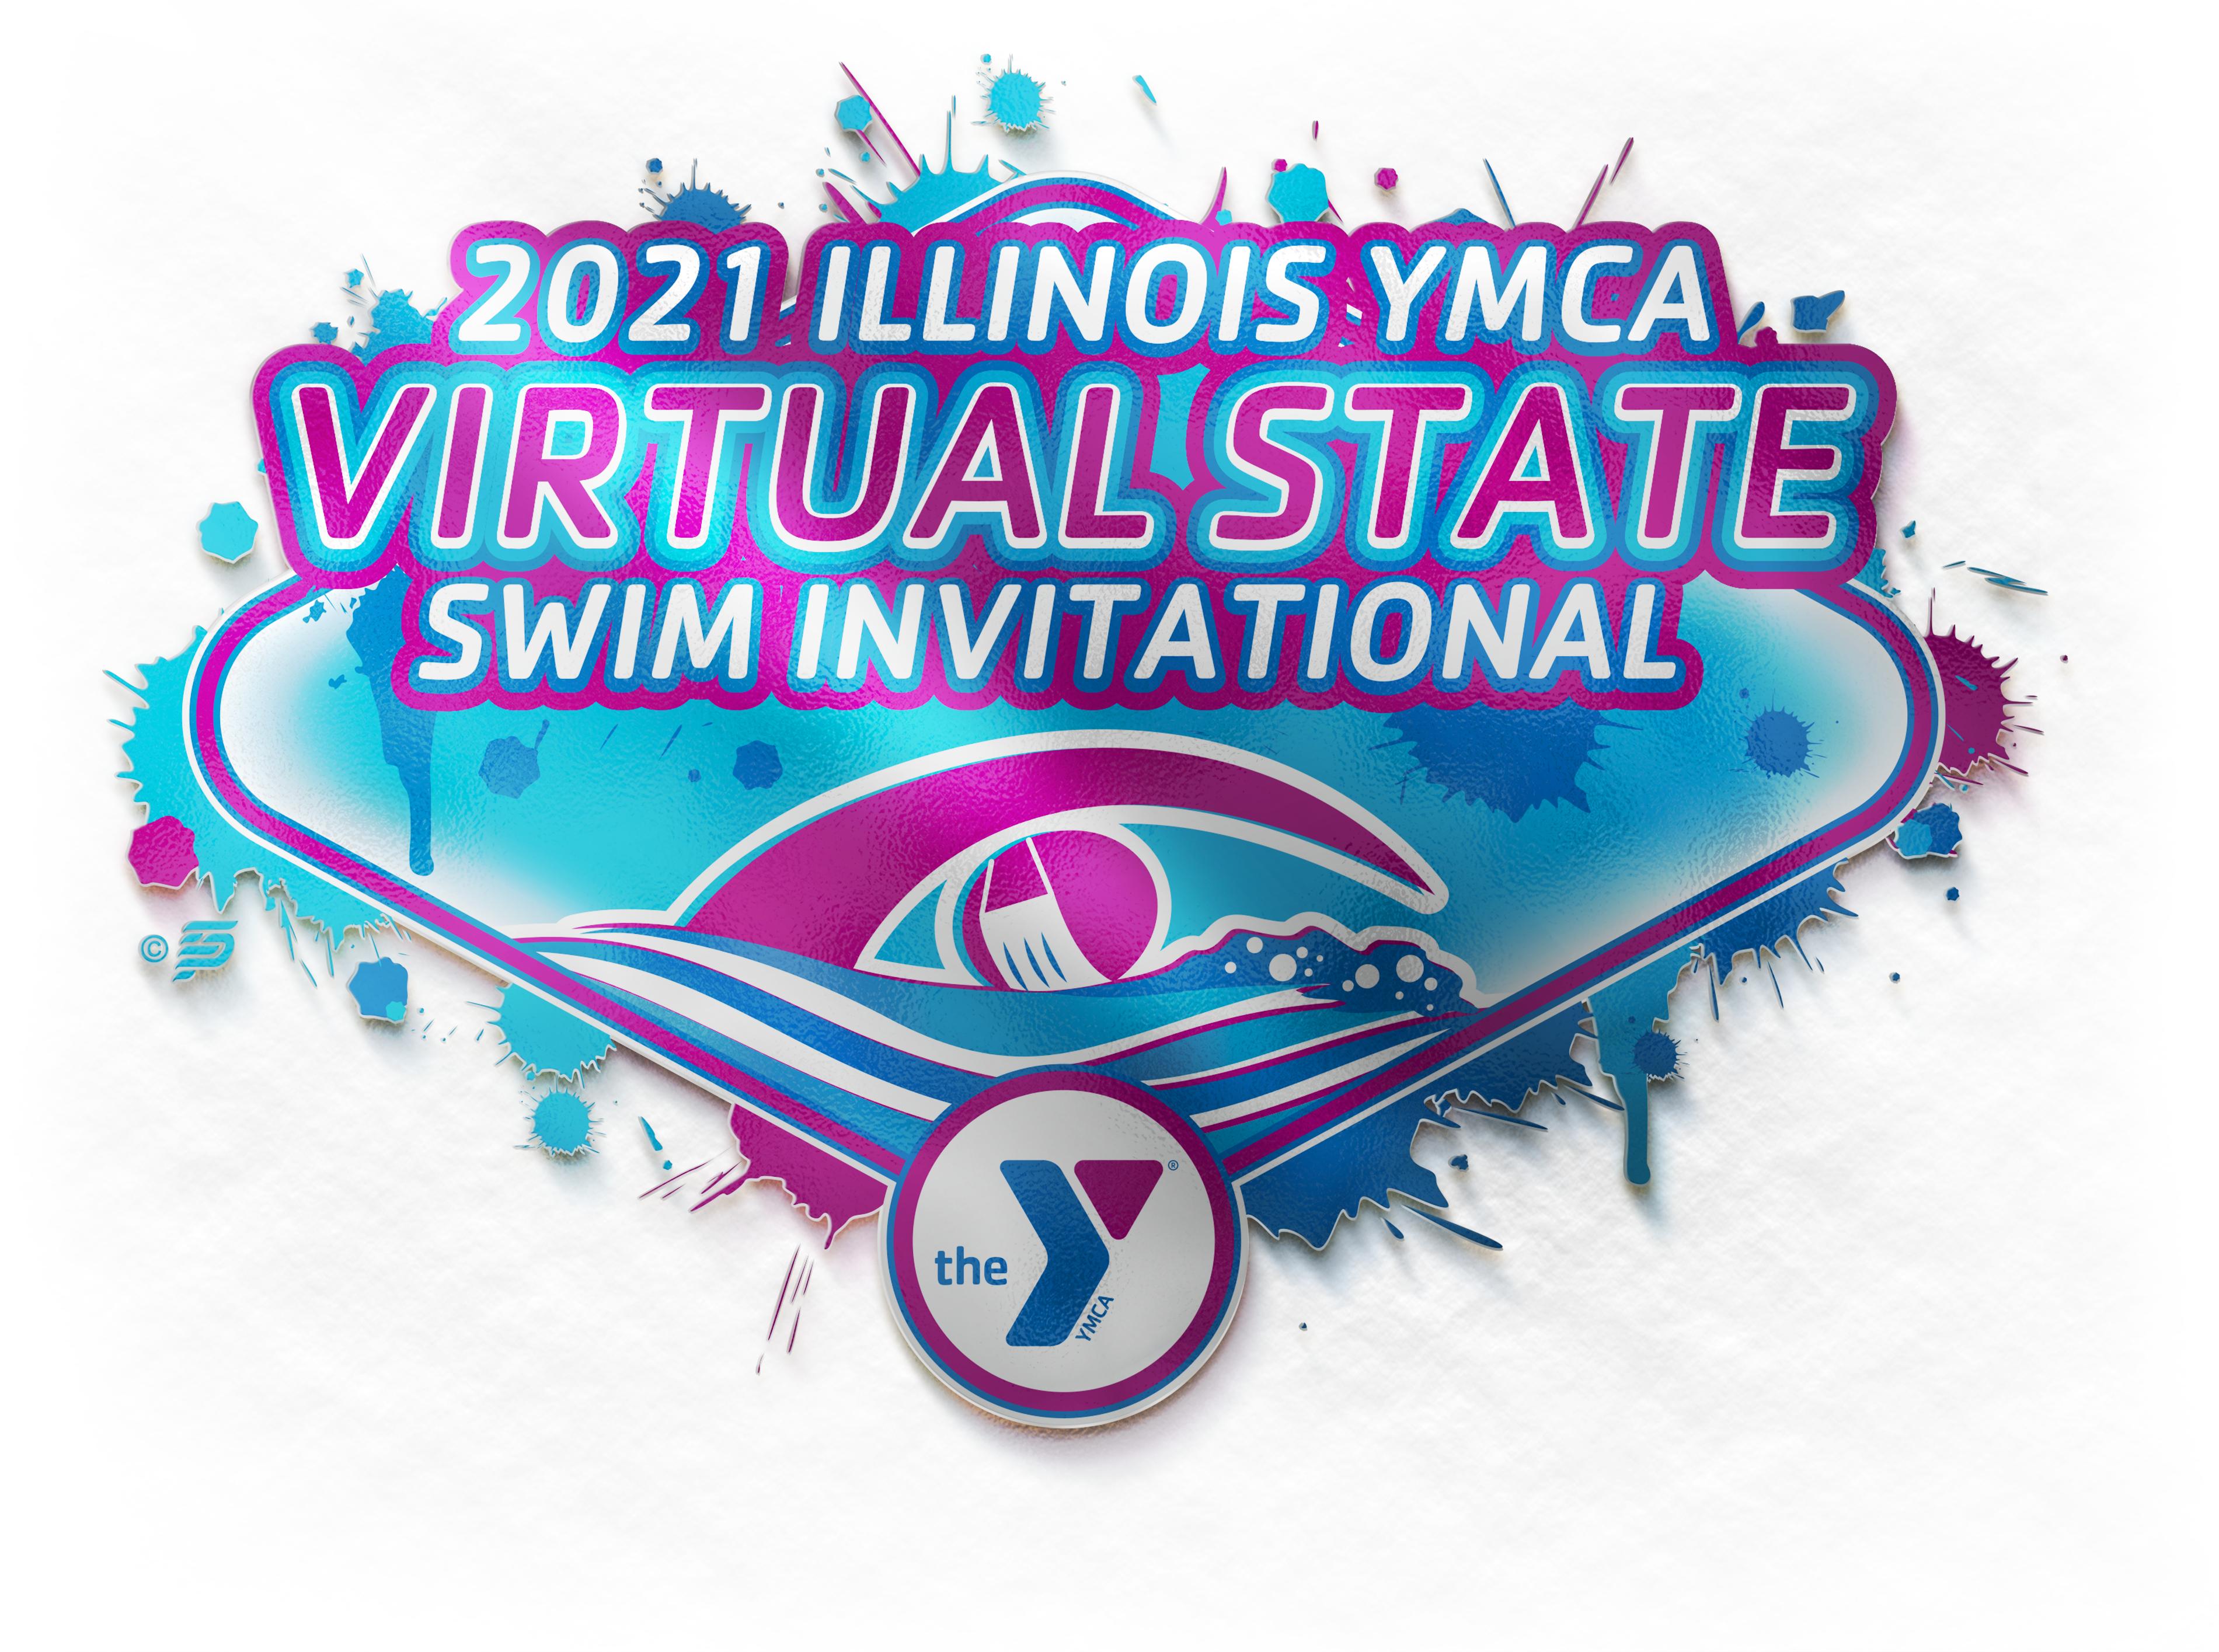 2021 Illinois YMCA Virtual State Invitational